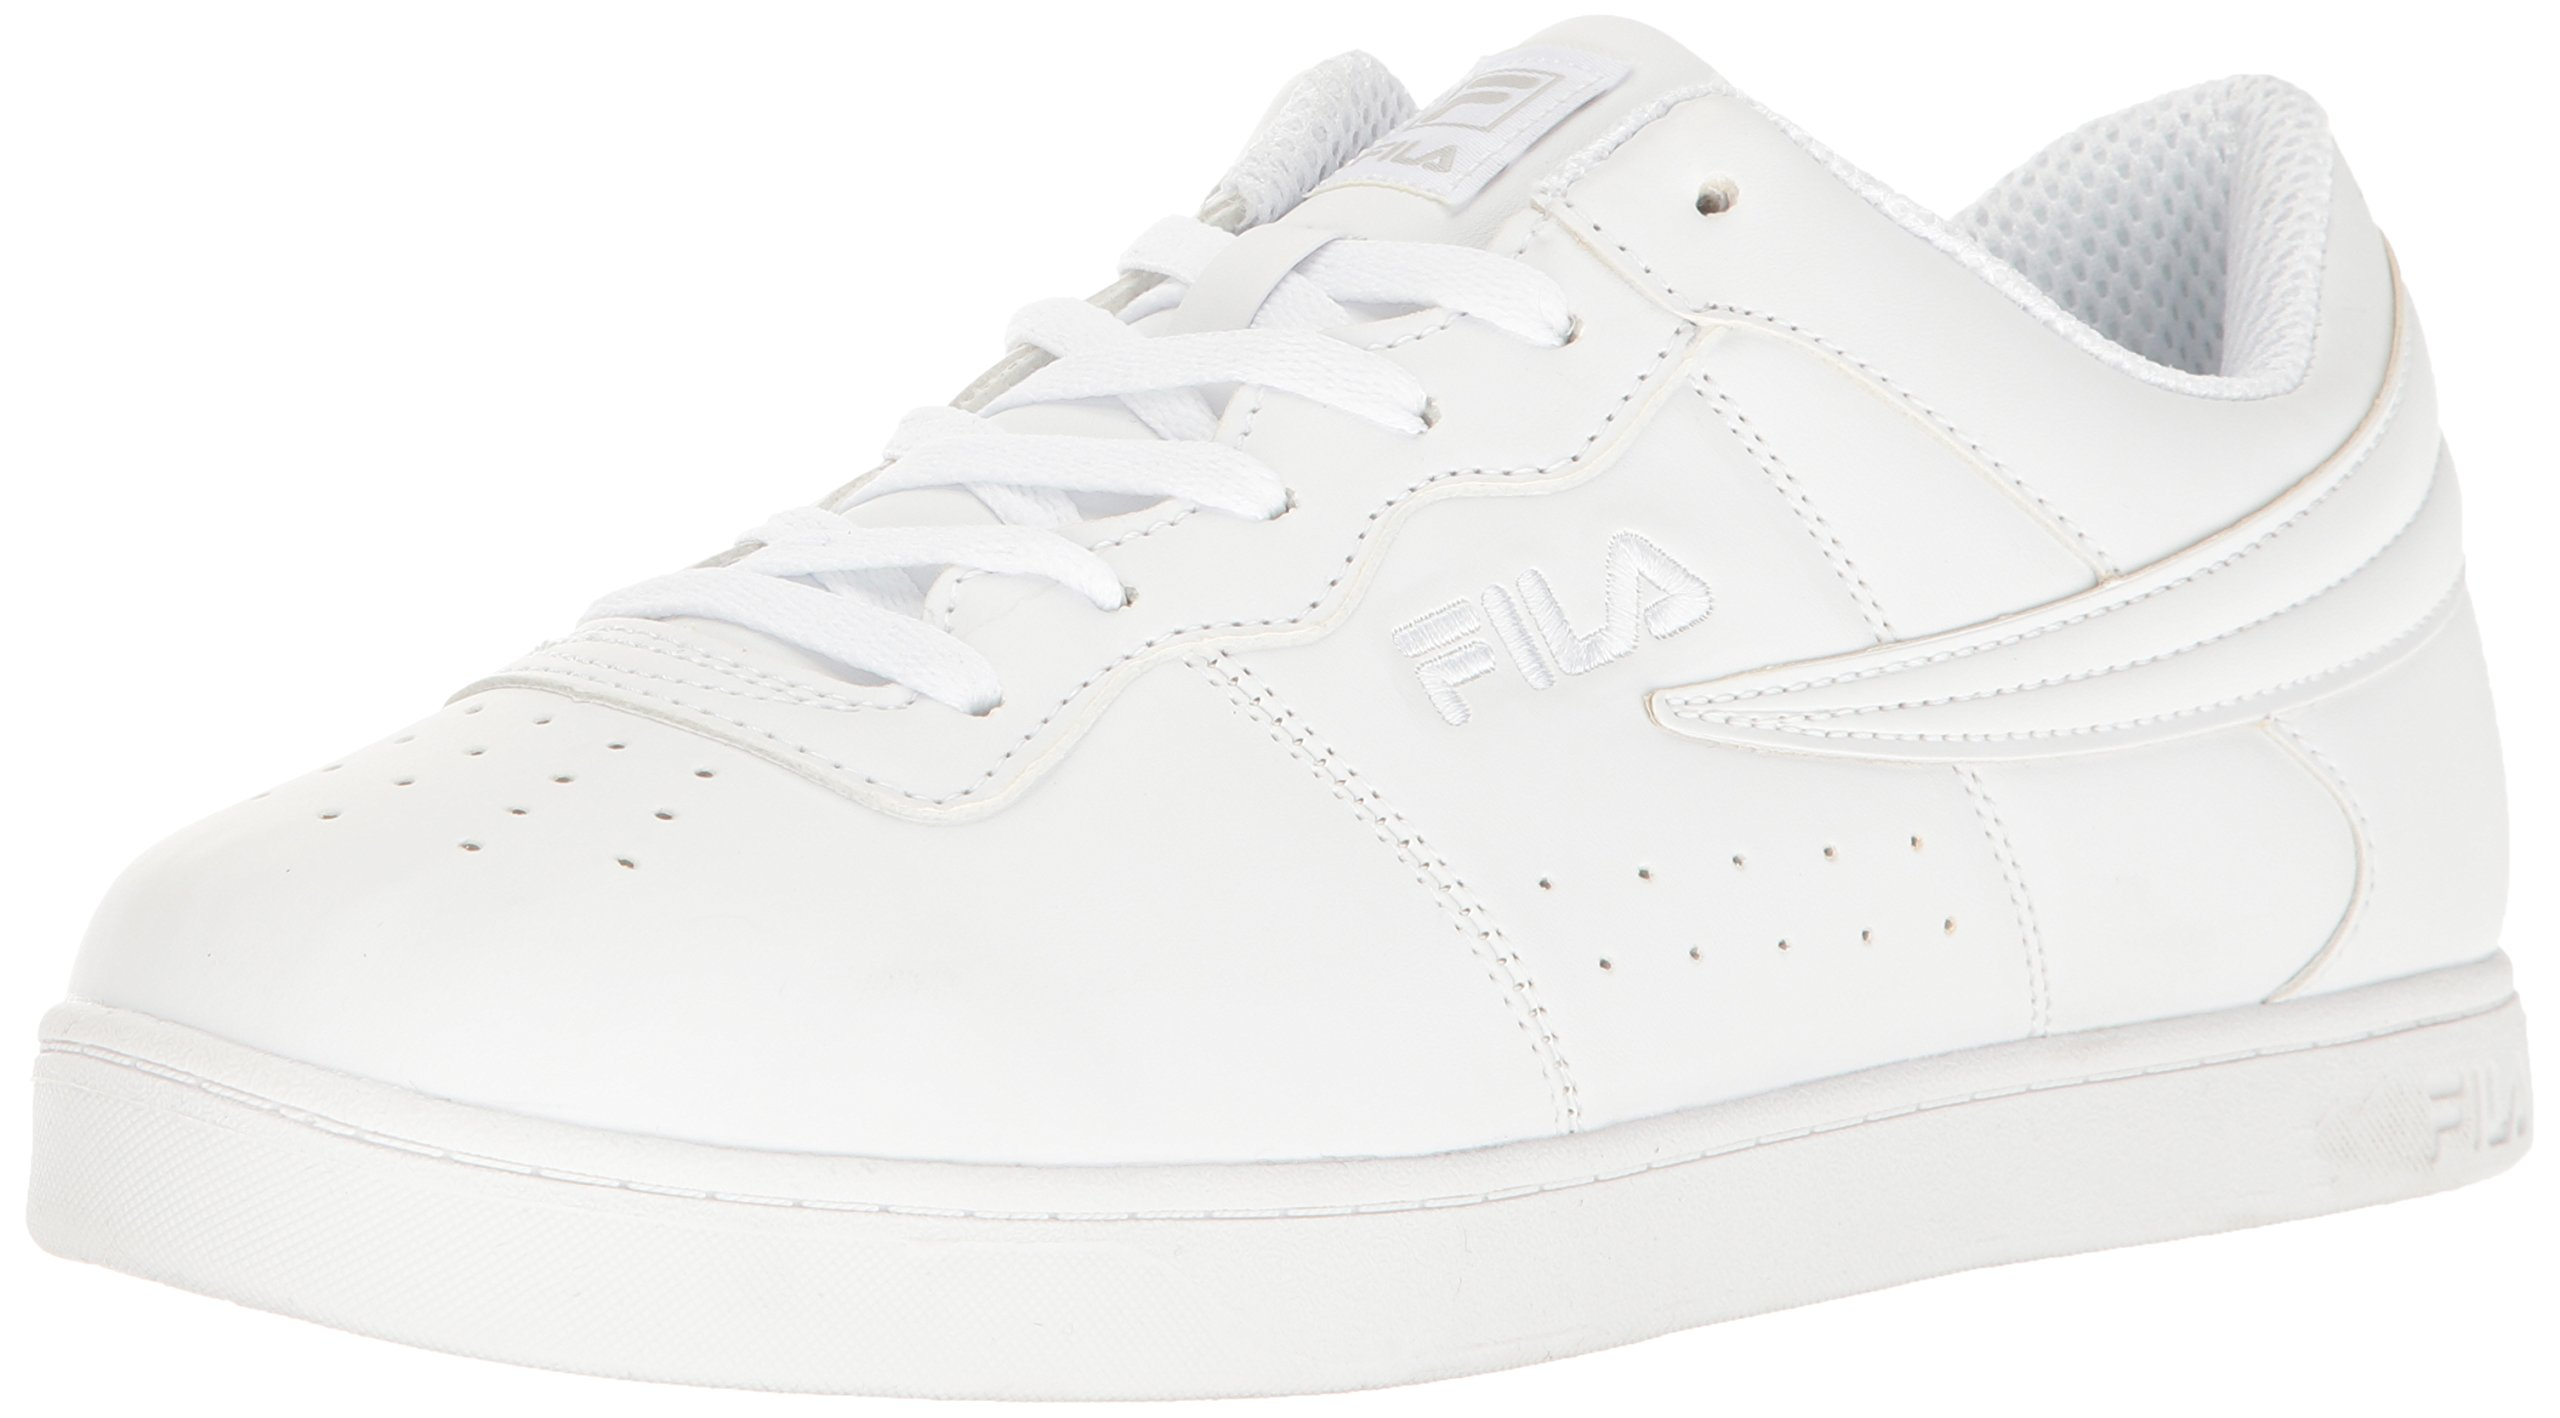 2432ba9280 Galleon - Fila Men's 13 Low Indoor Court Shoe, White/White/White, 9.5 D US